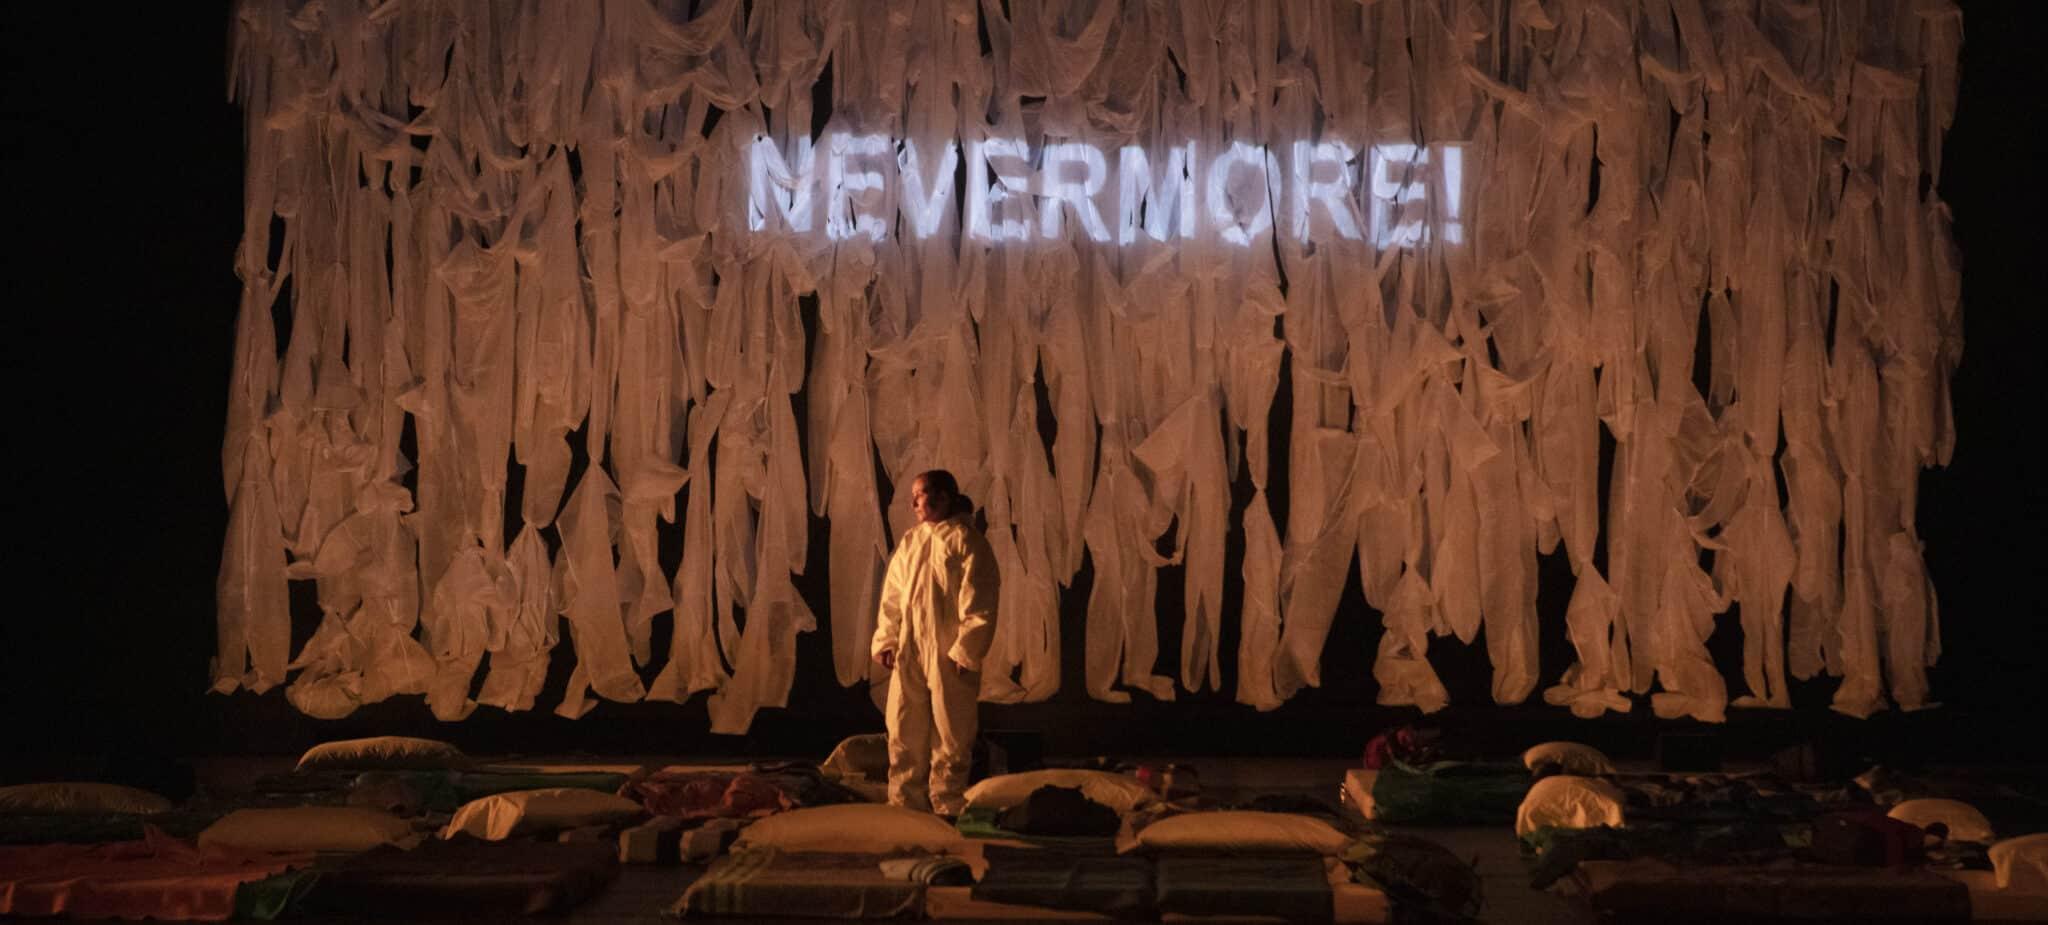 N.E.V.E.R.M.O.R.E, memorias de una tragedia - El Independiente